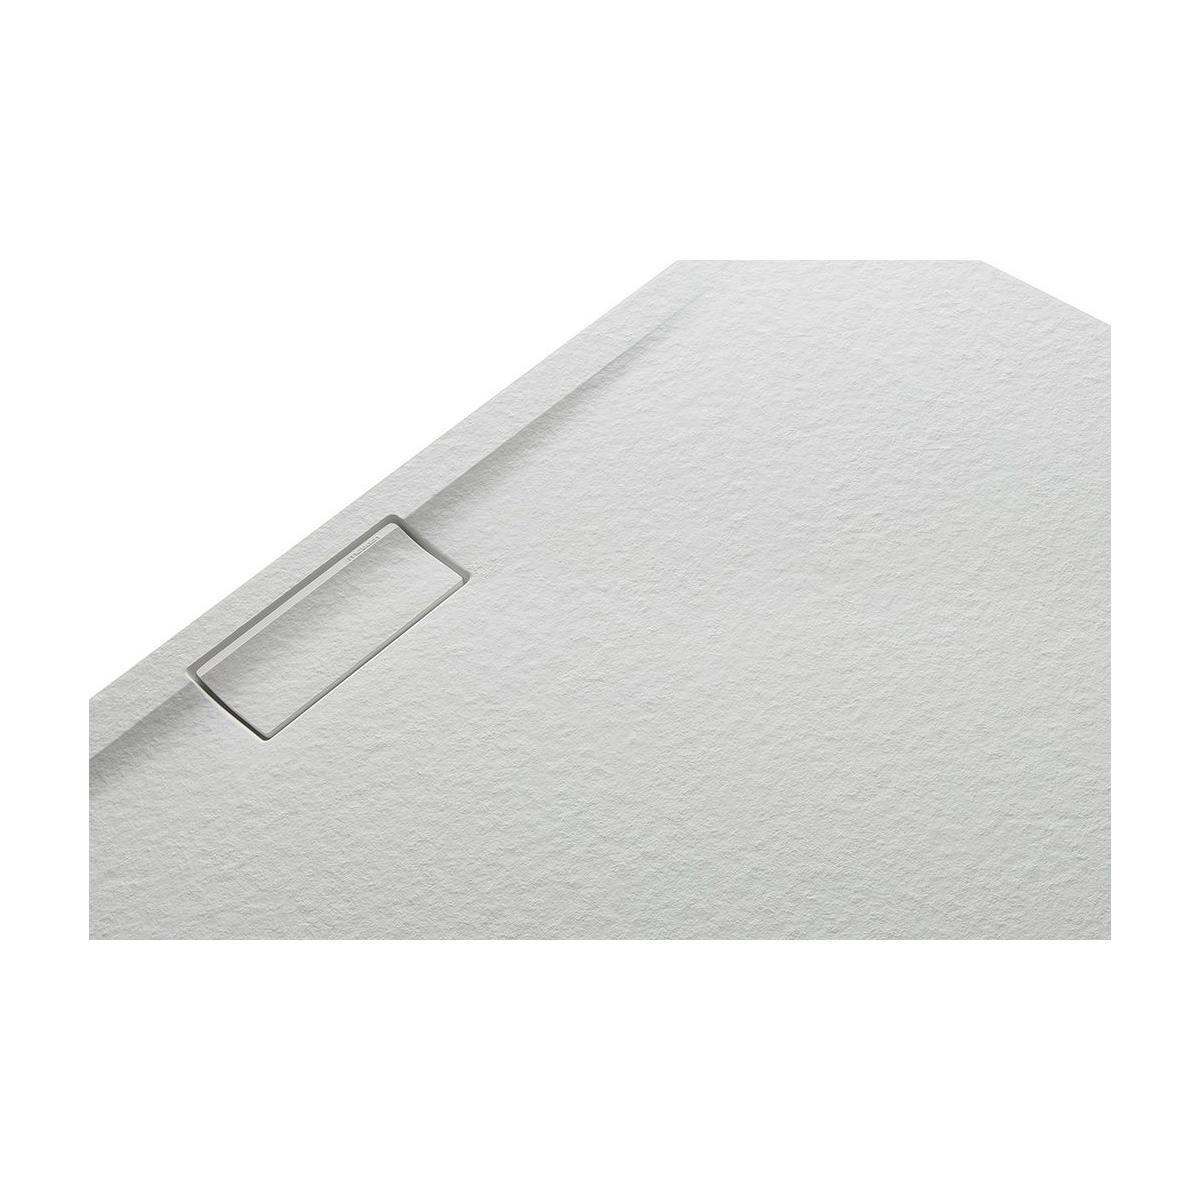 Plato de ducha rectangular 100x80 Nova Stone Cover Perla